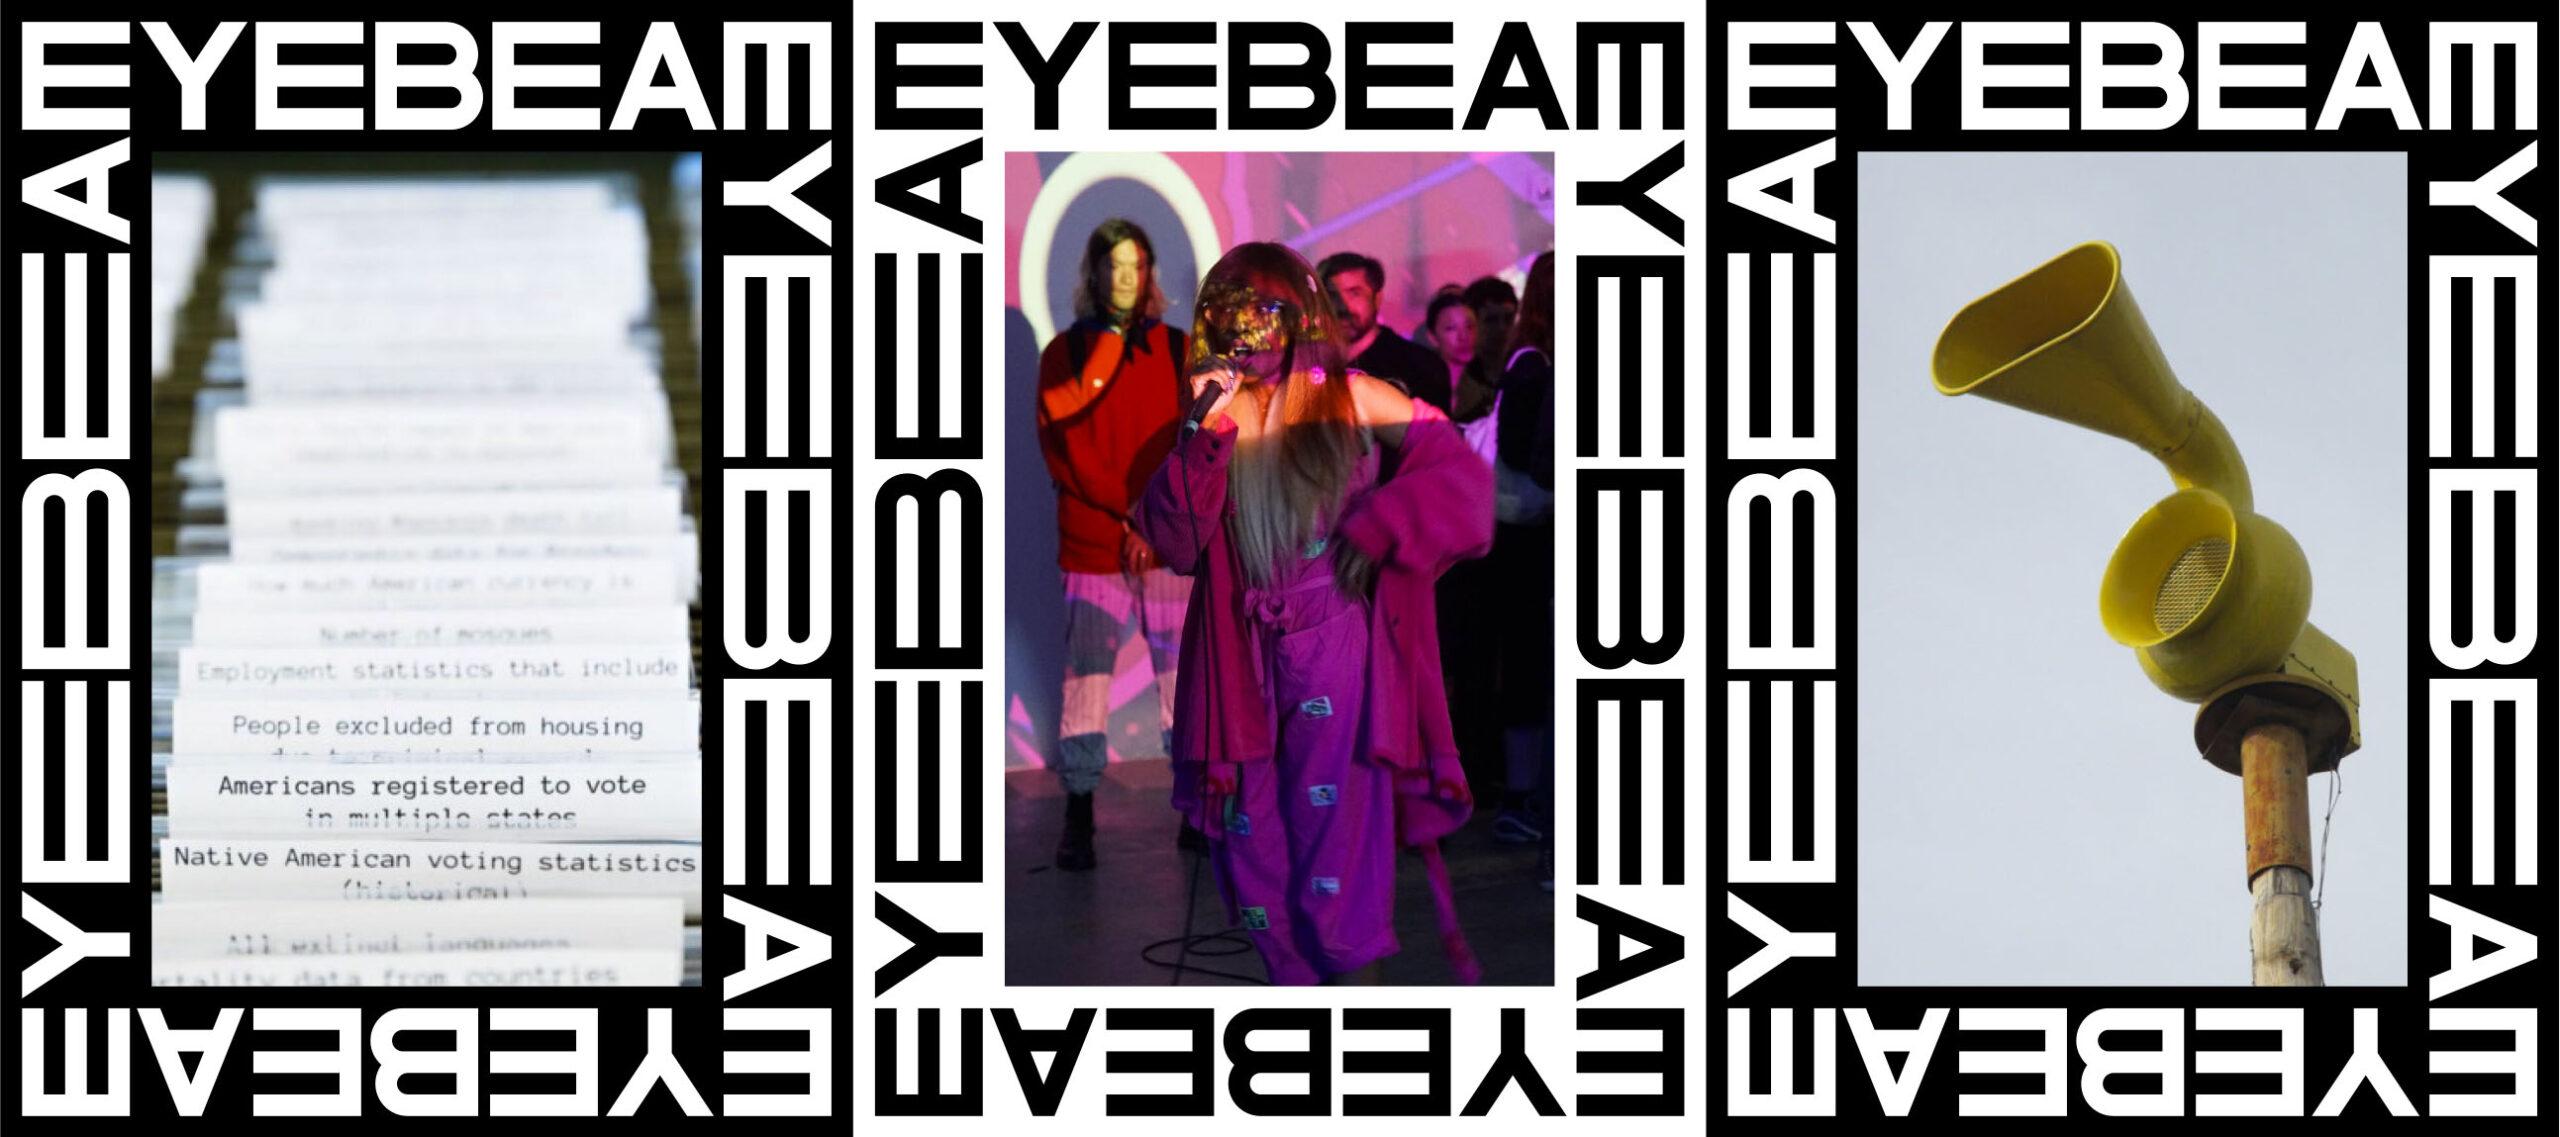 eyebeamframe